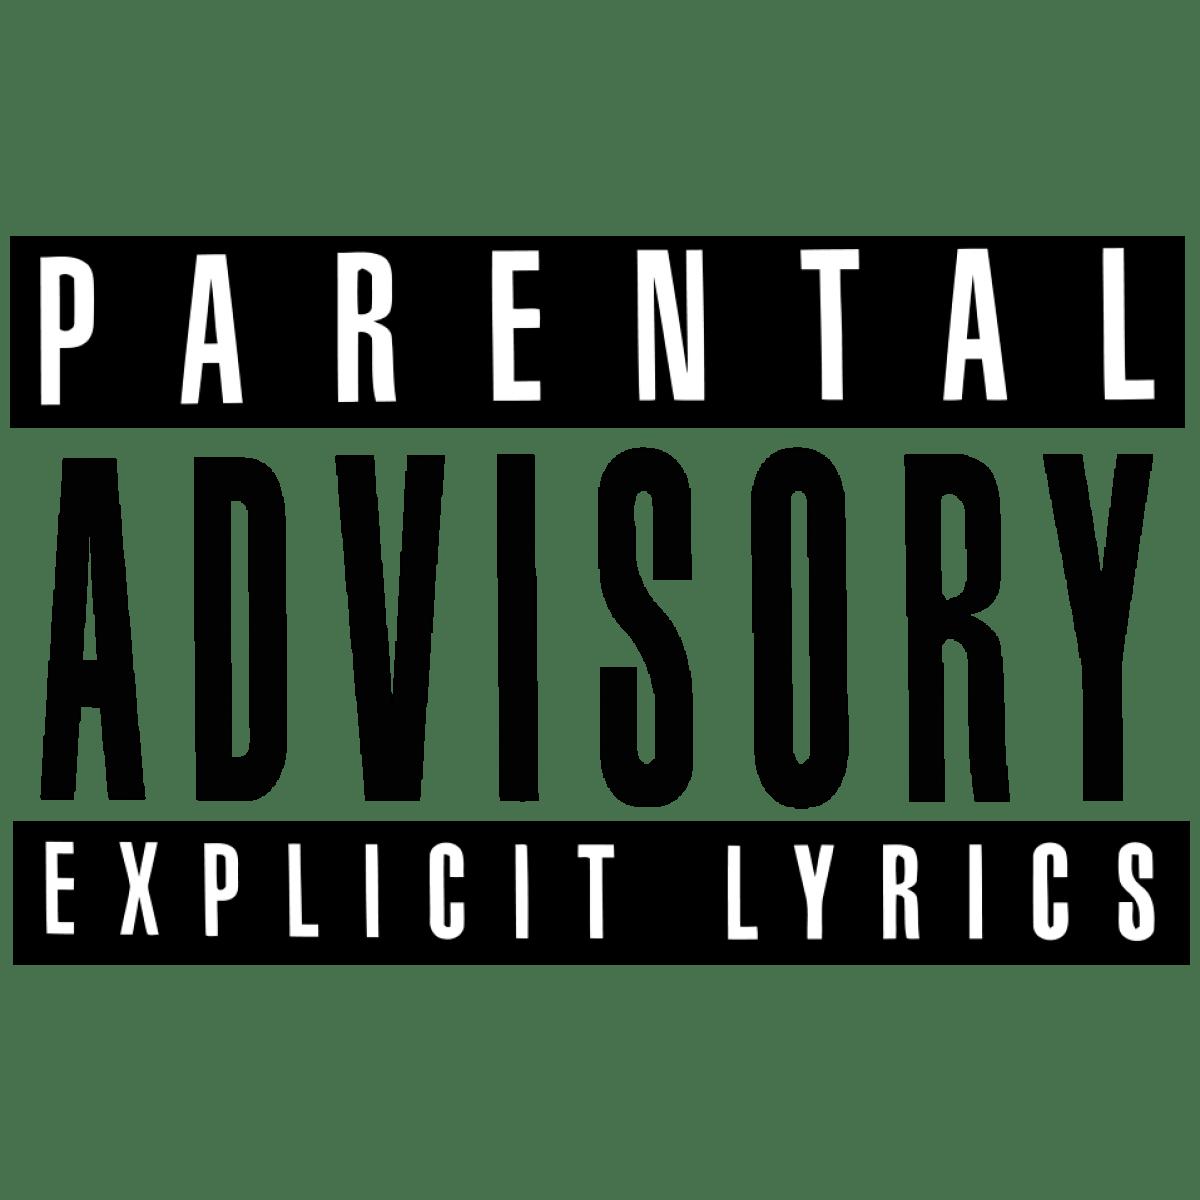 Hd Parental Advisory Png Transparent.